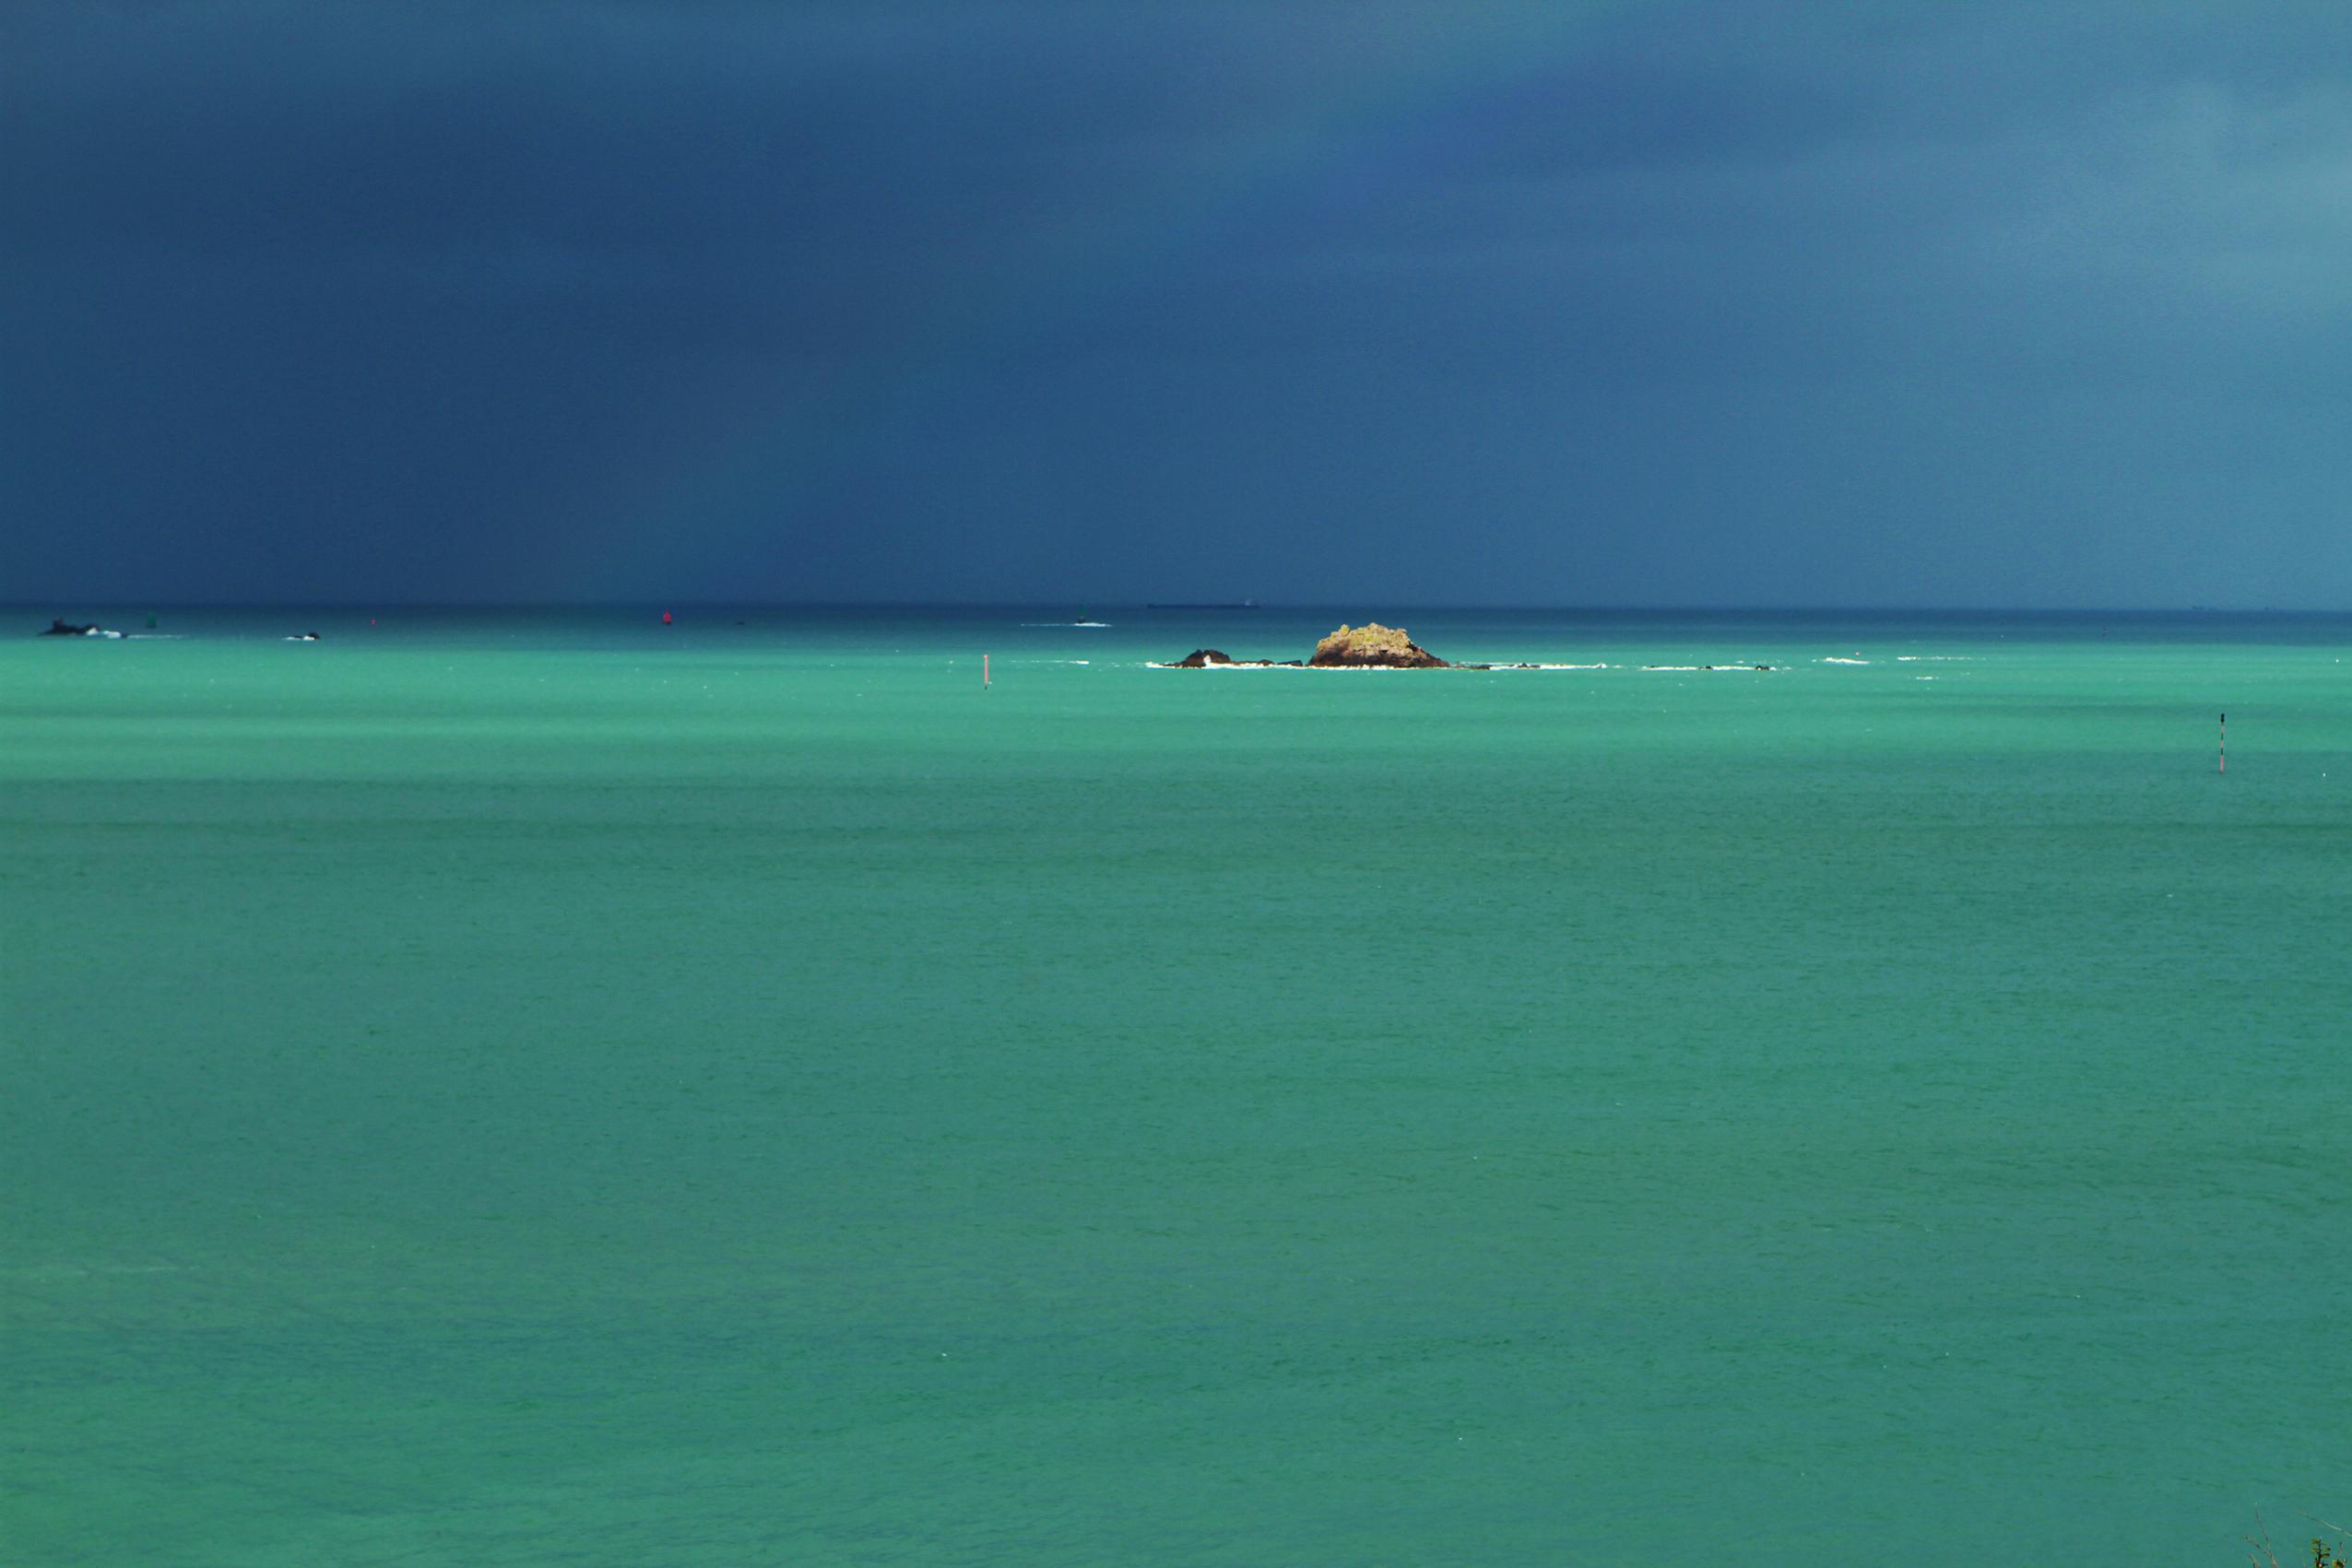 orage vert émeraude fourberie plage Saint-Lunaire